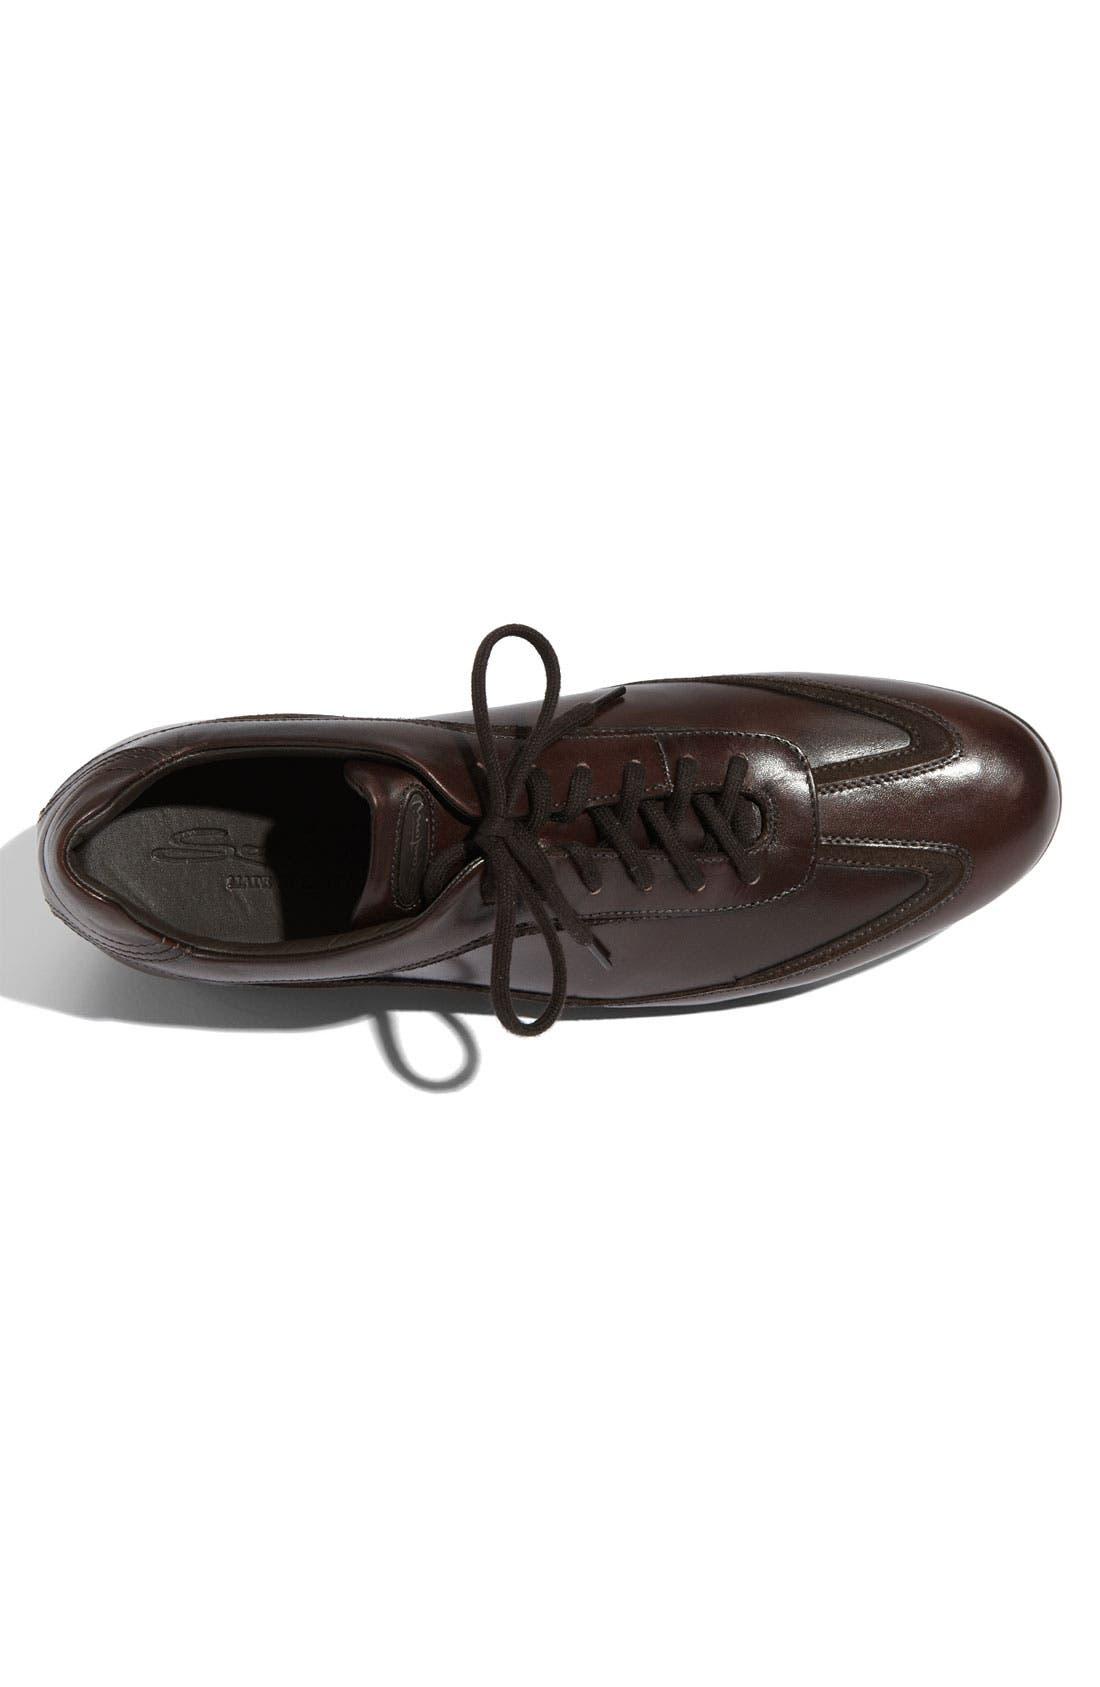 Alternate Image 2  - Santoni 'Marlin' Sneaker (Men)